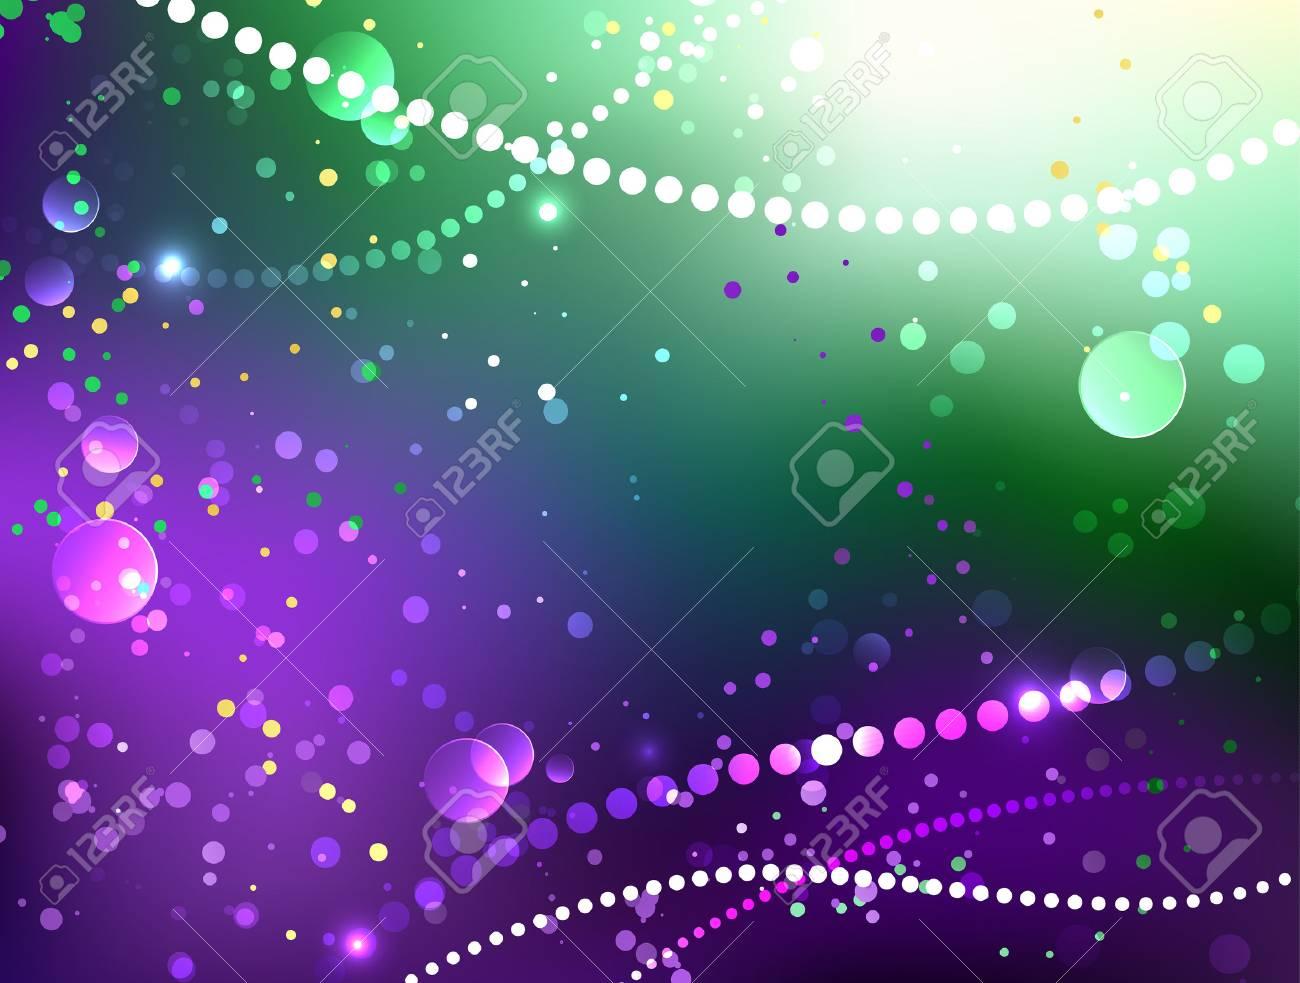 Bright purple and green background with shiny confetti  Festival